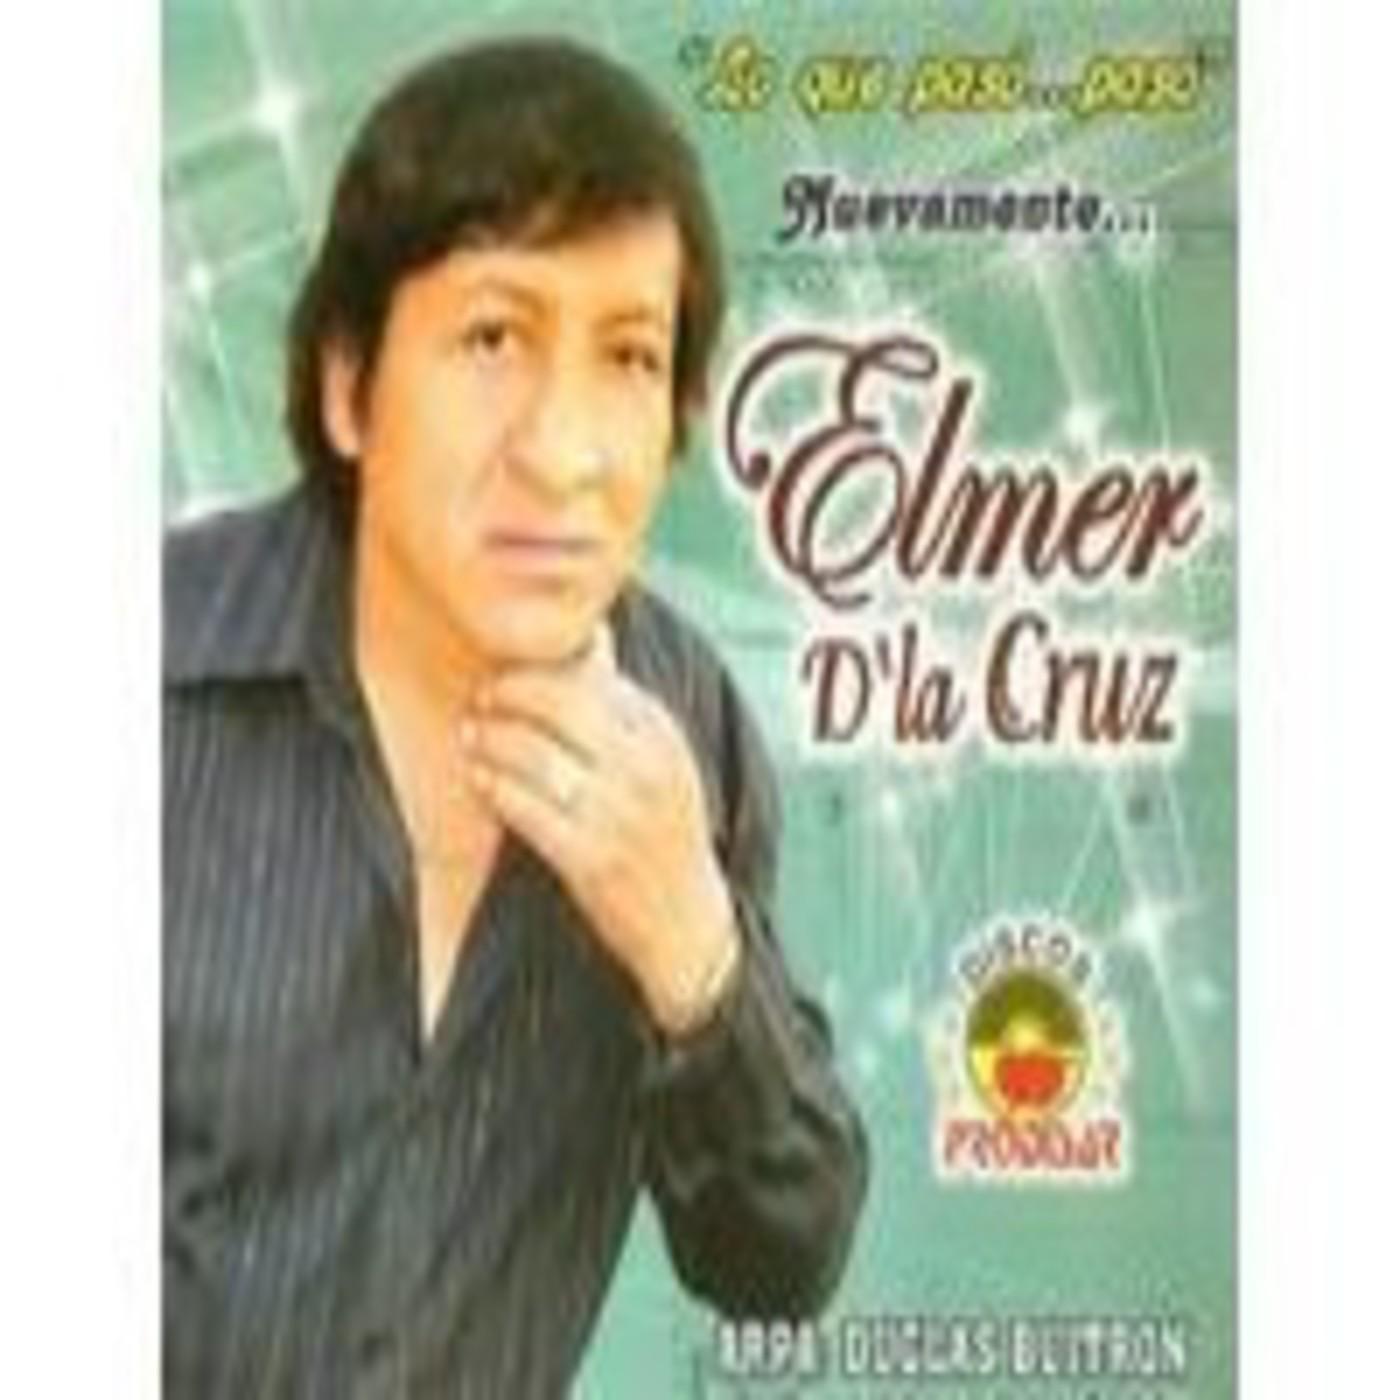 Radio folklore argentina online dating 3